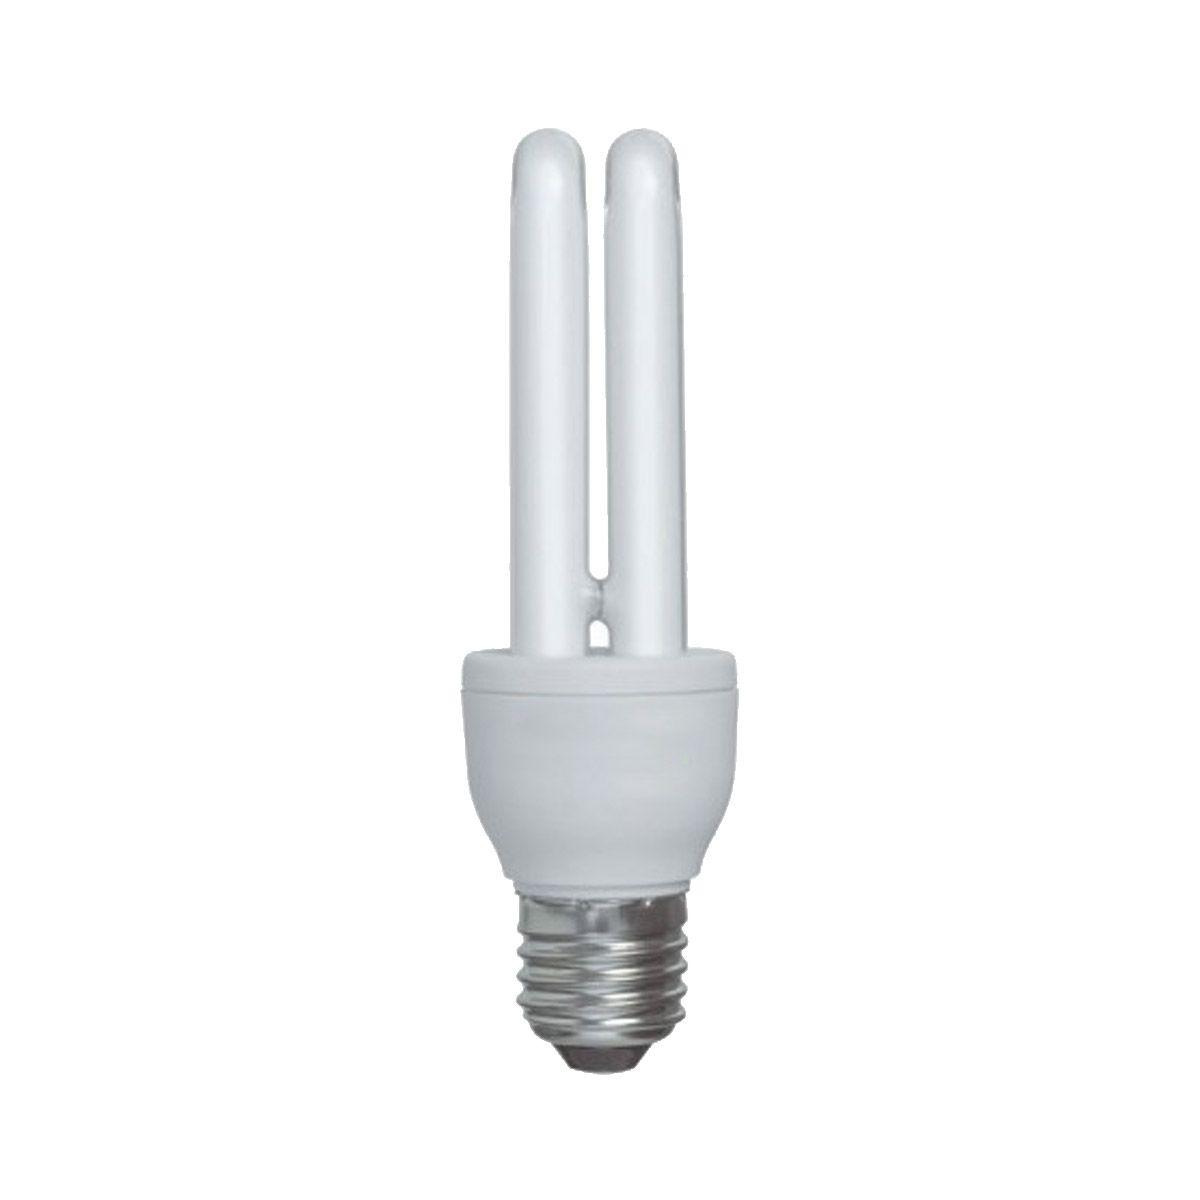 Lâmpada Fluorescente Compacta 9W 220V